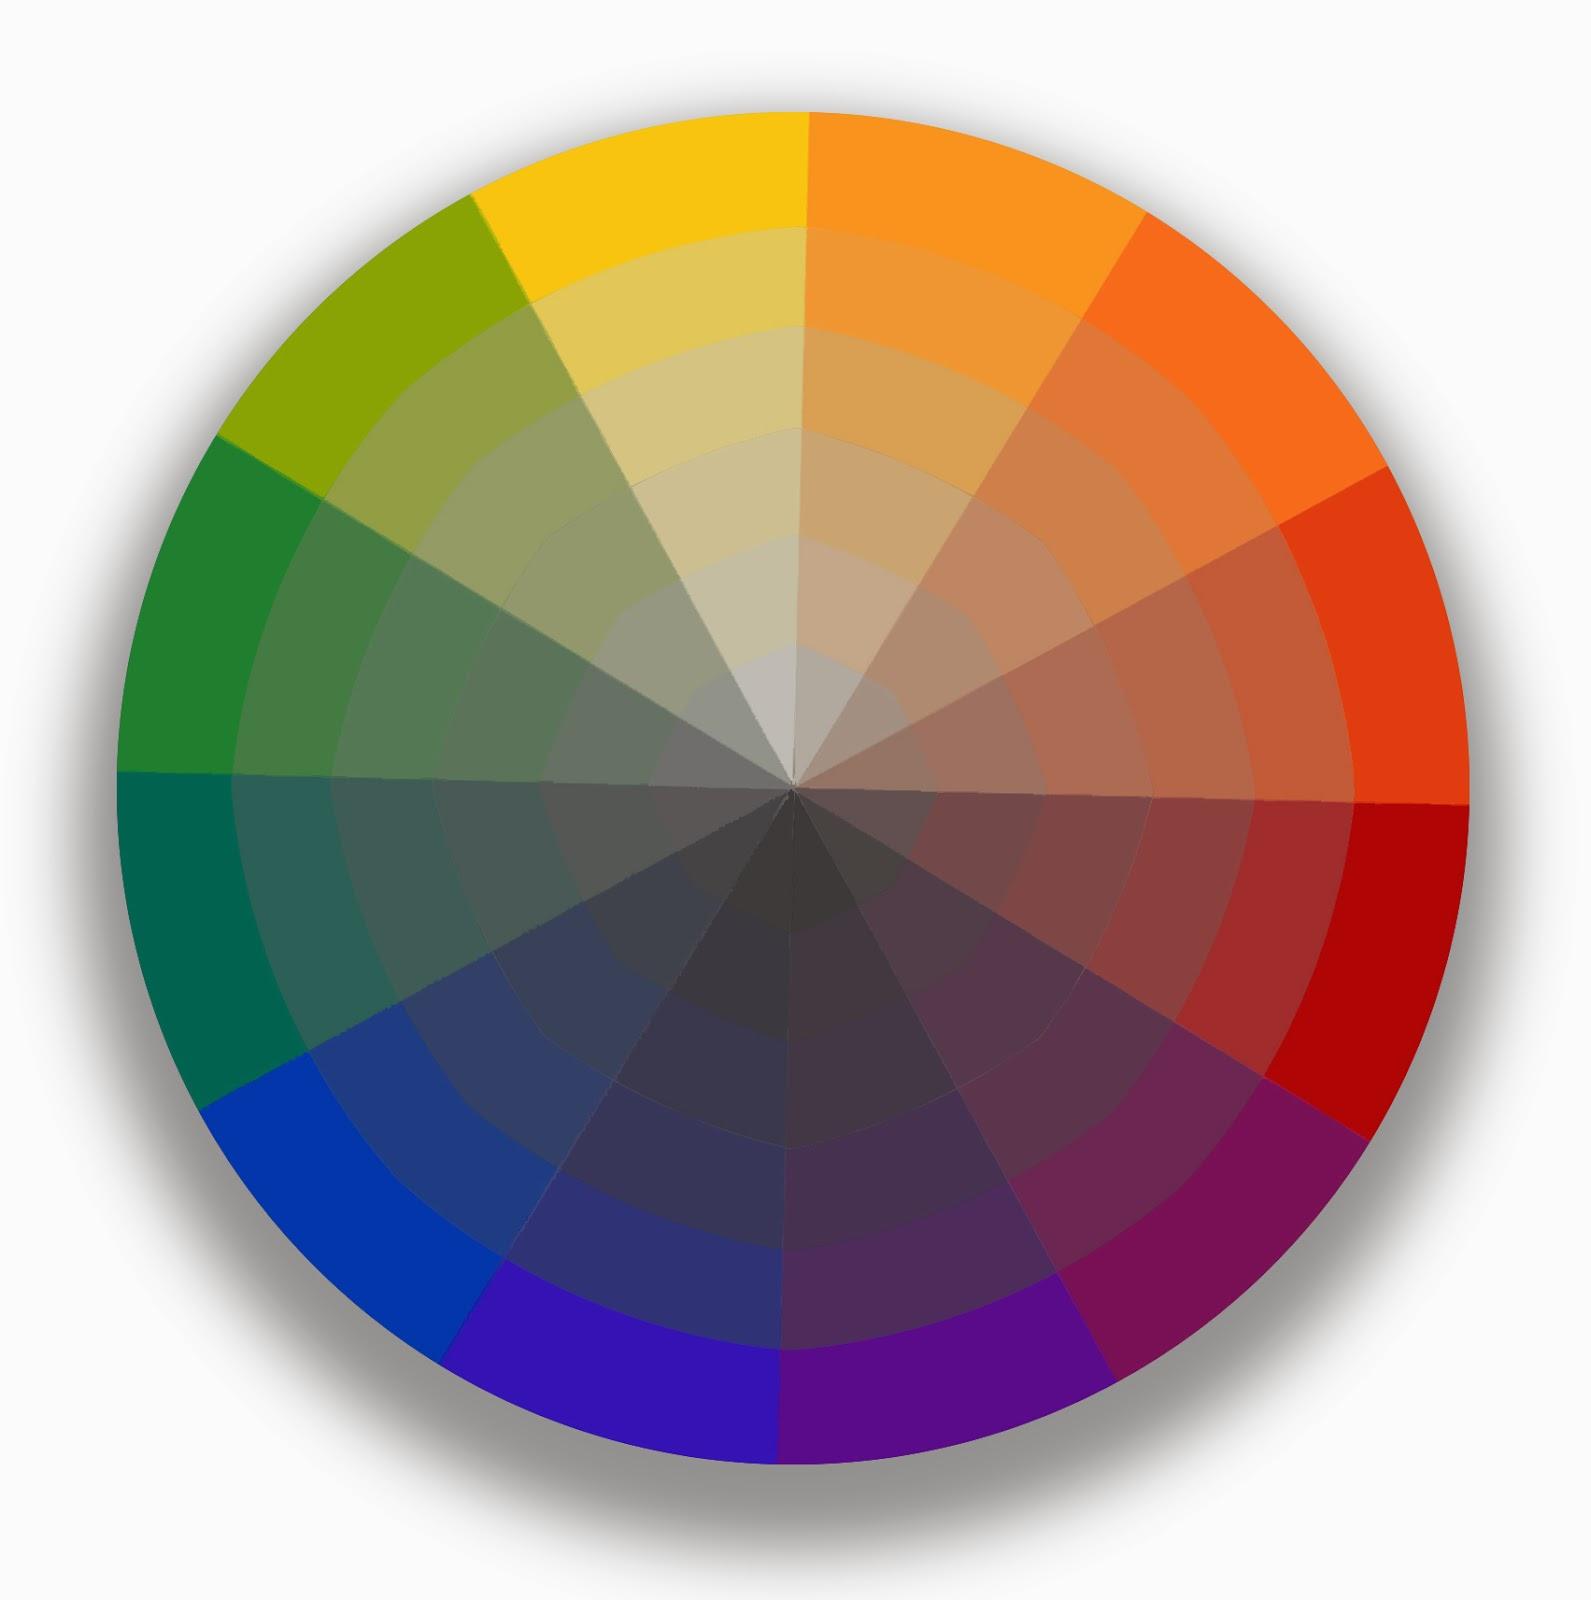 Image Sources Color Wheel